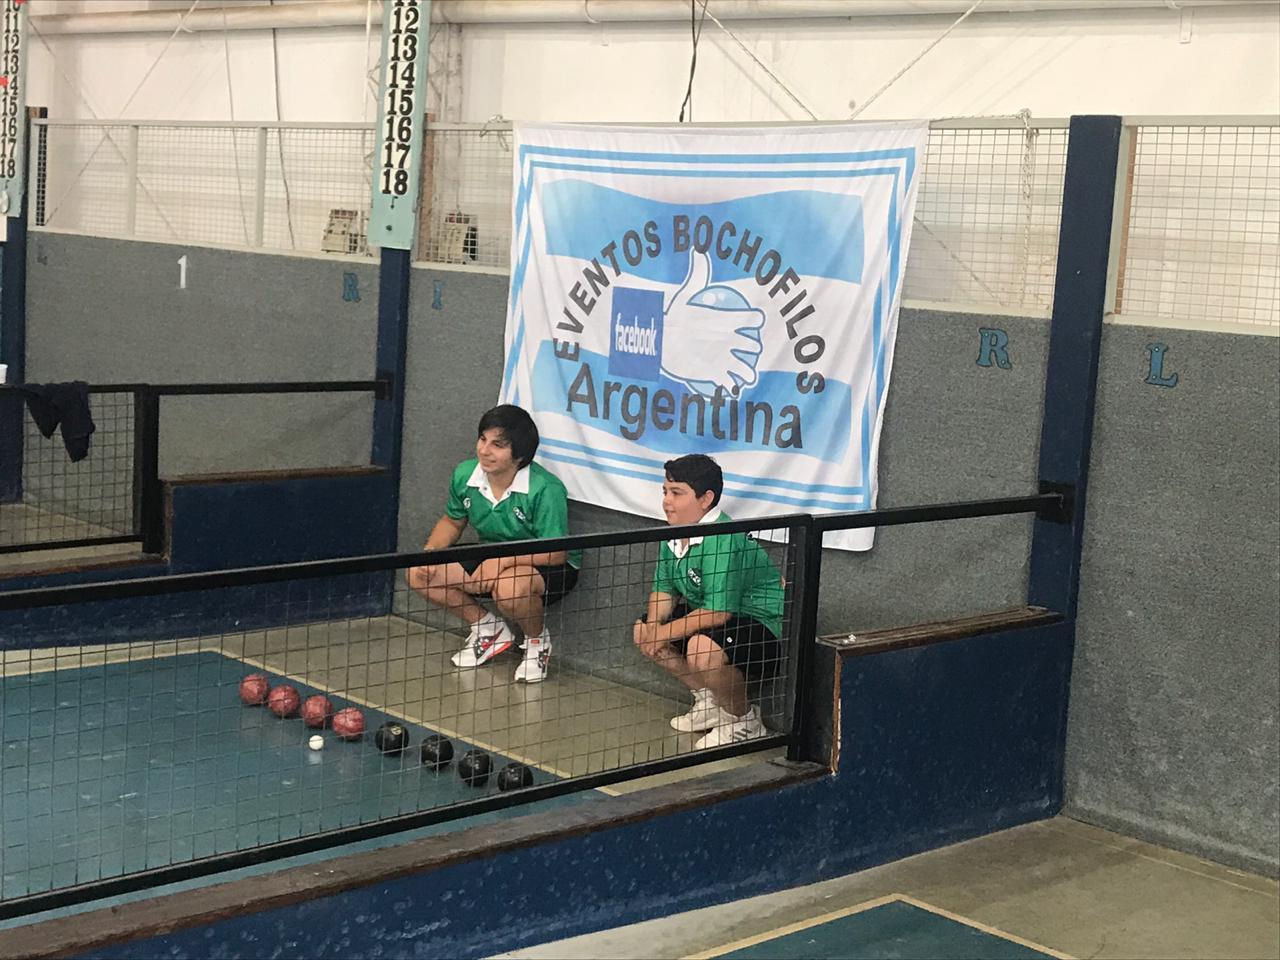 Dos chacabuquenses campeones en Córdoba